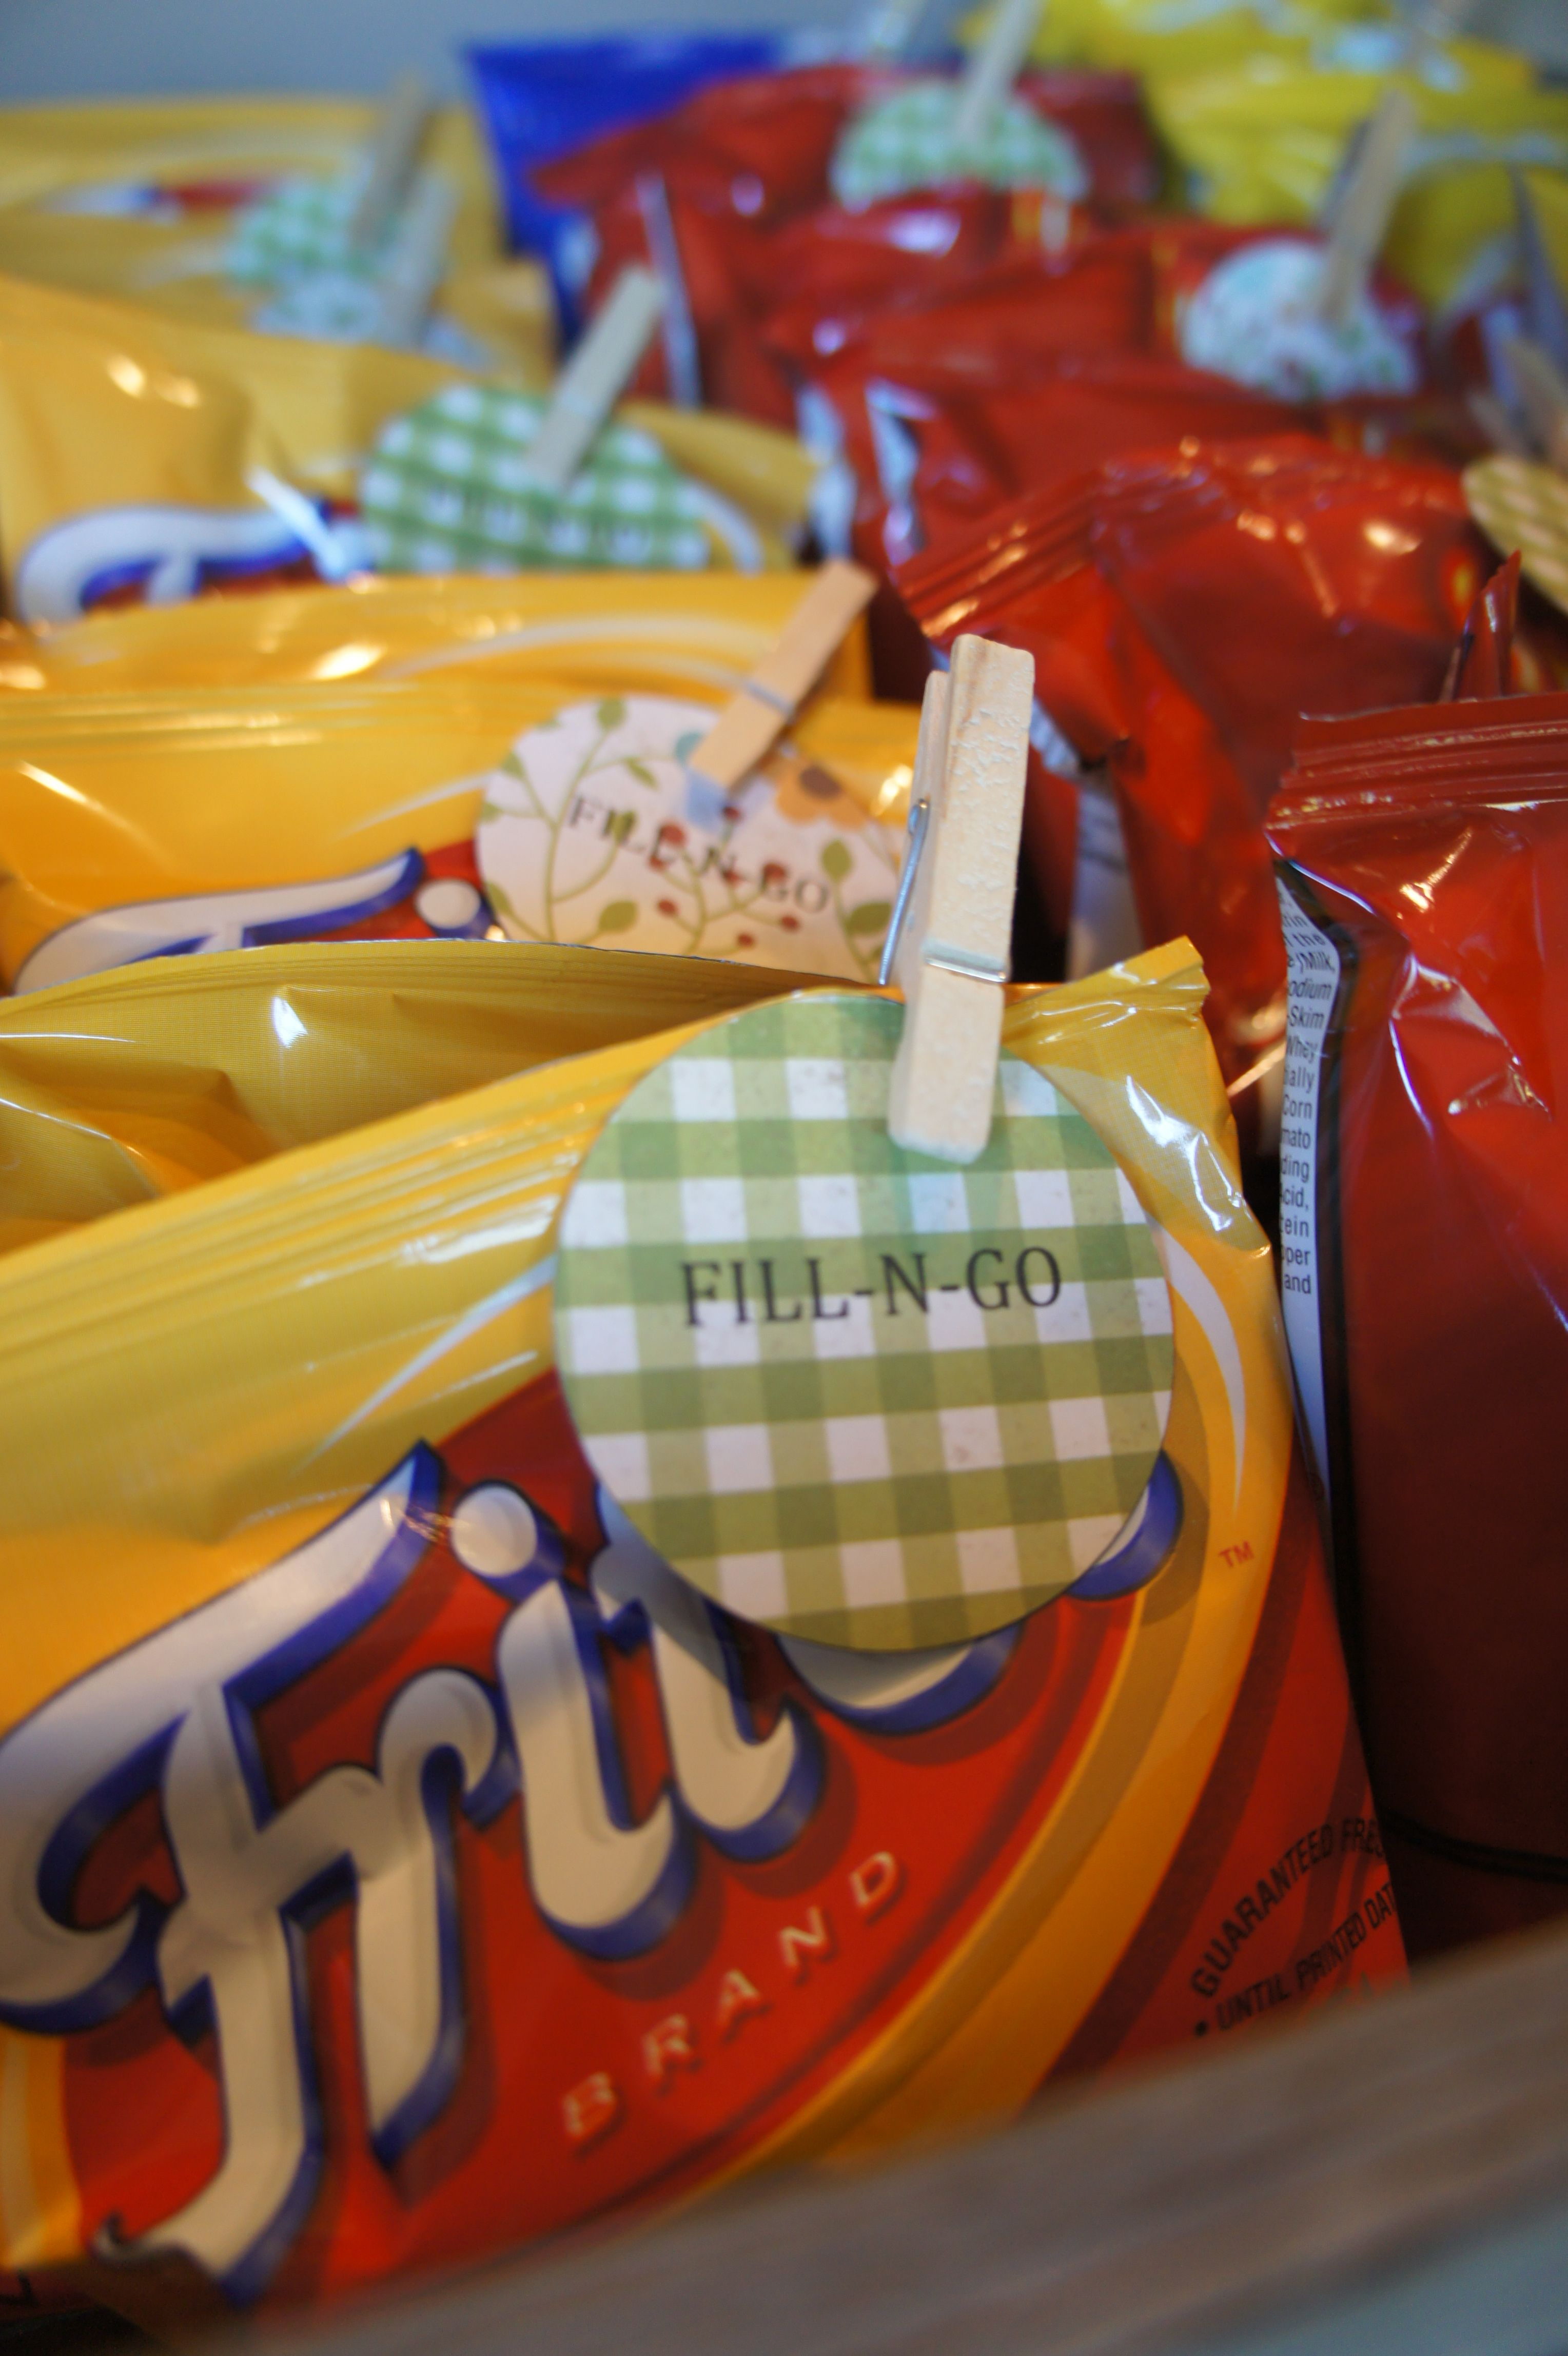 Chili Bar Fill-N-Go Bags